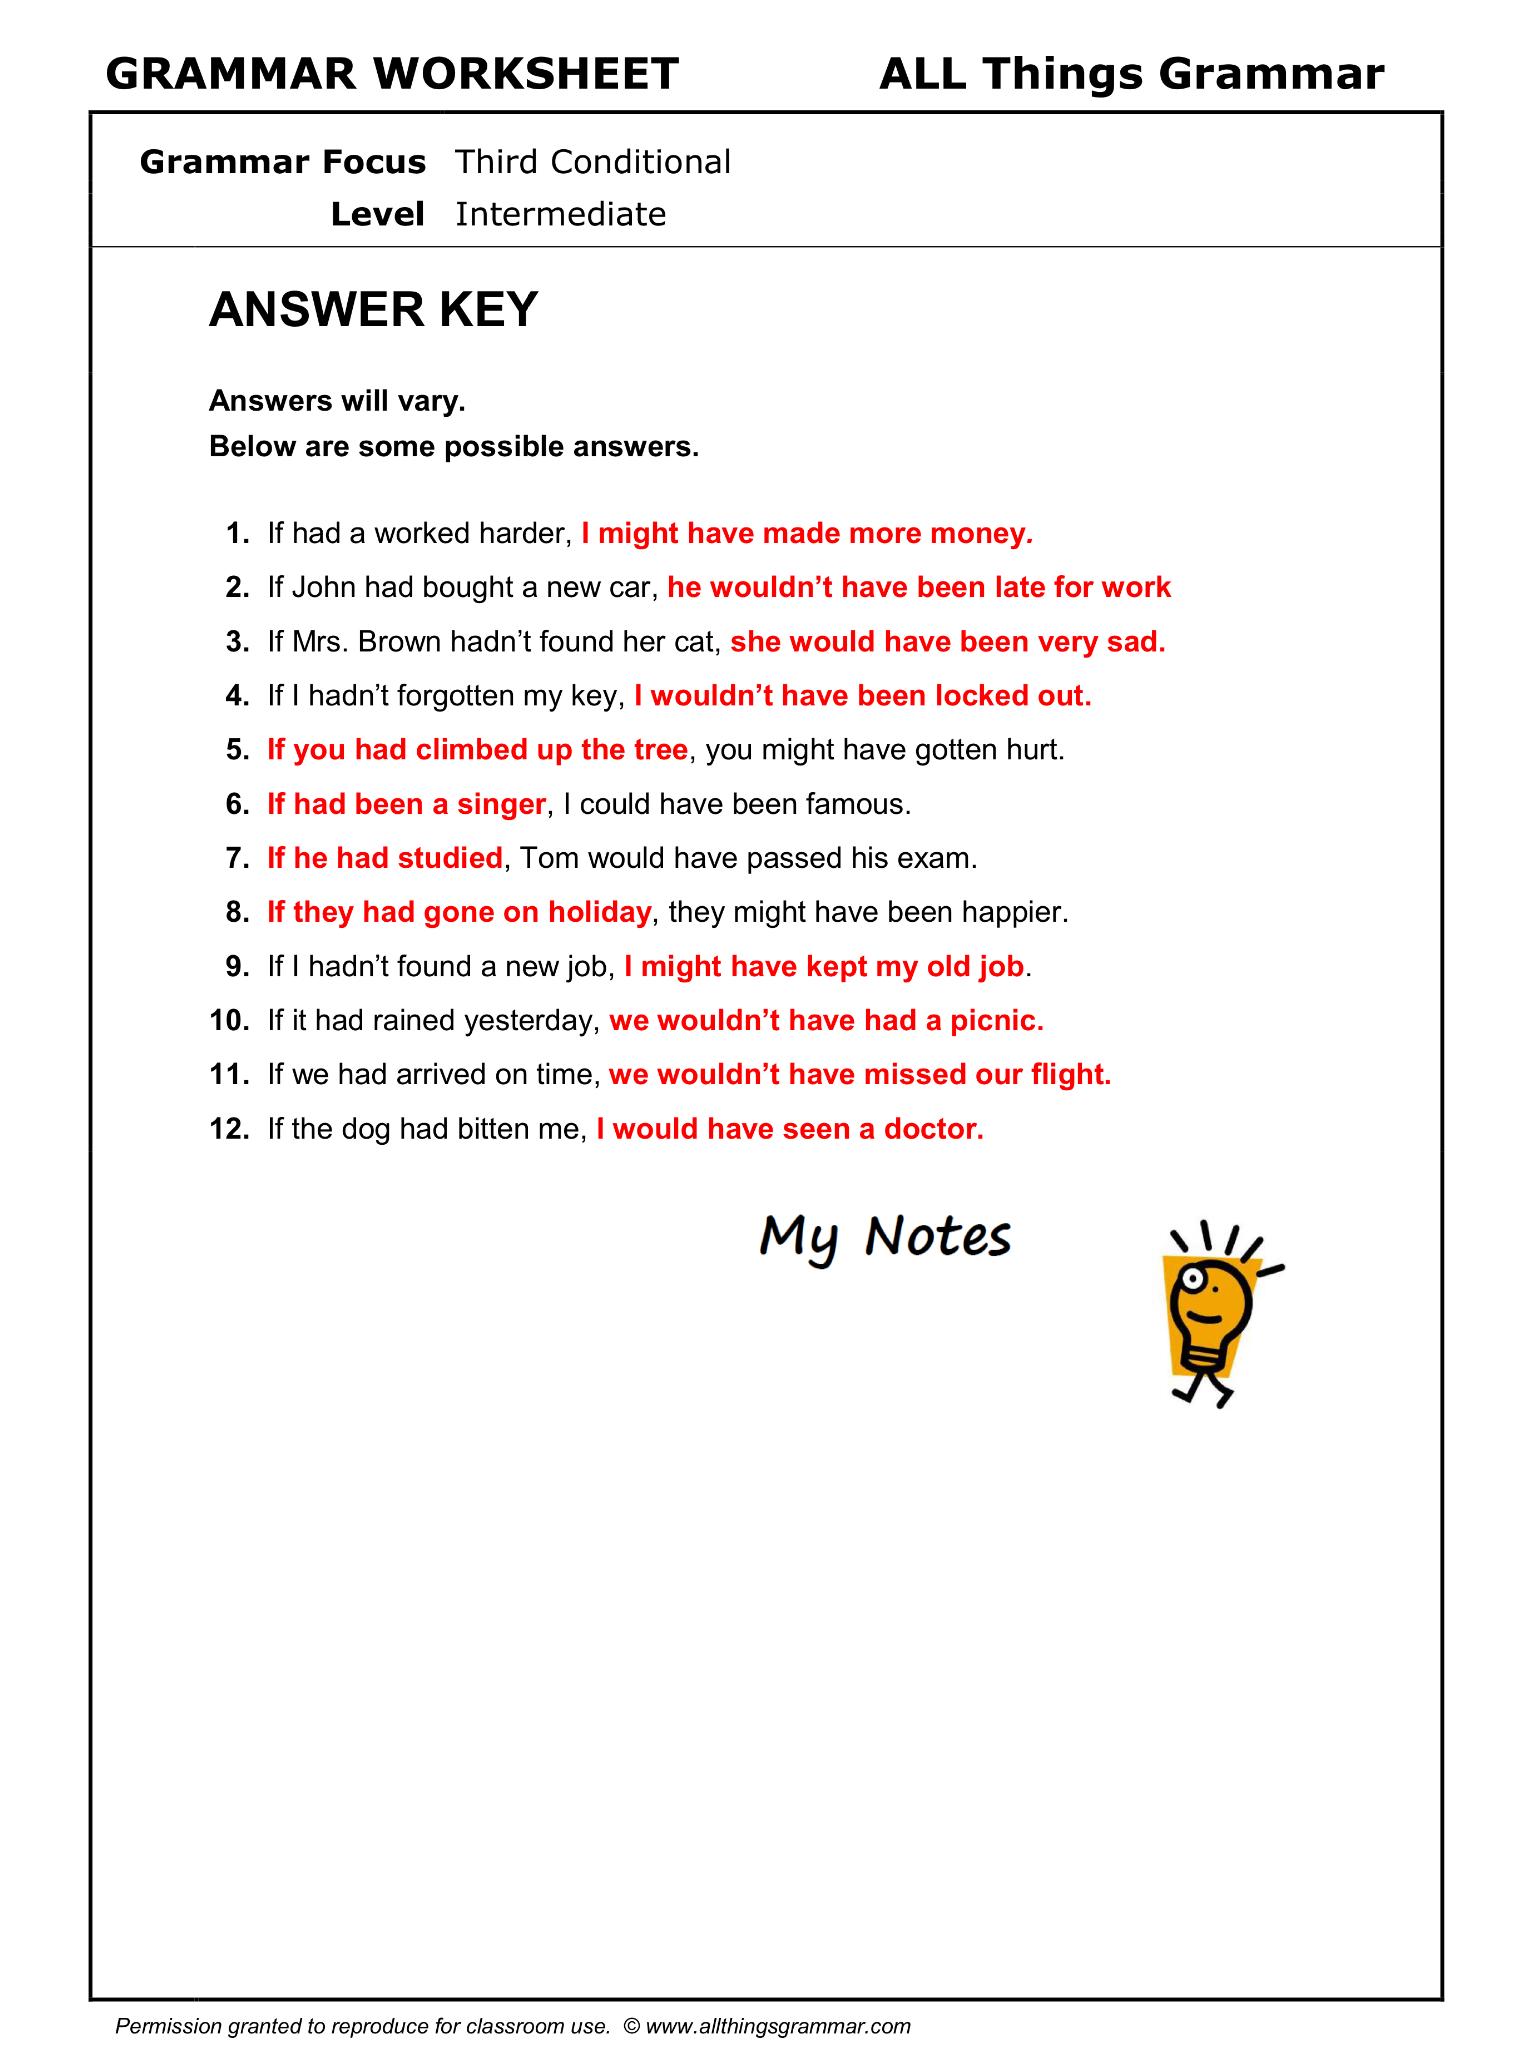 English Grammar Worksheet Third Conditional 2 2 Http Www Allthingsgrammar Com Third Condition English Grammar Worksheets English Grammar Grammar Worksheets [ 2048 x 1536 Pixel ]